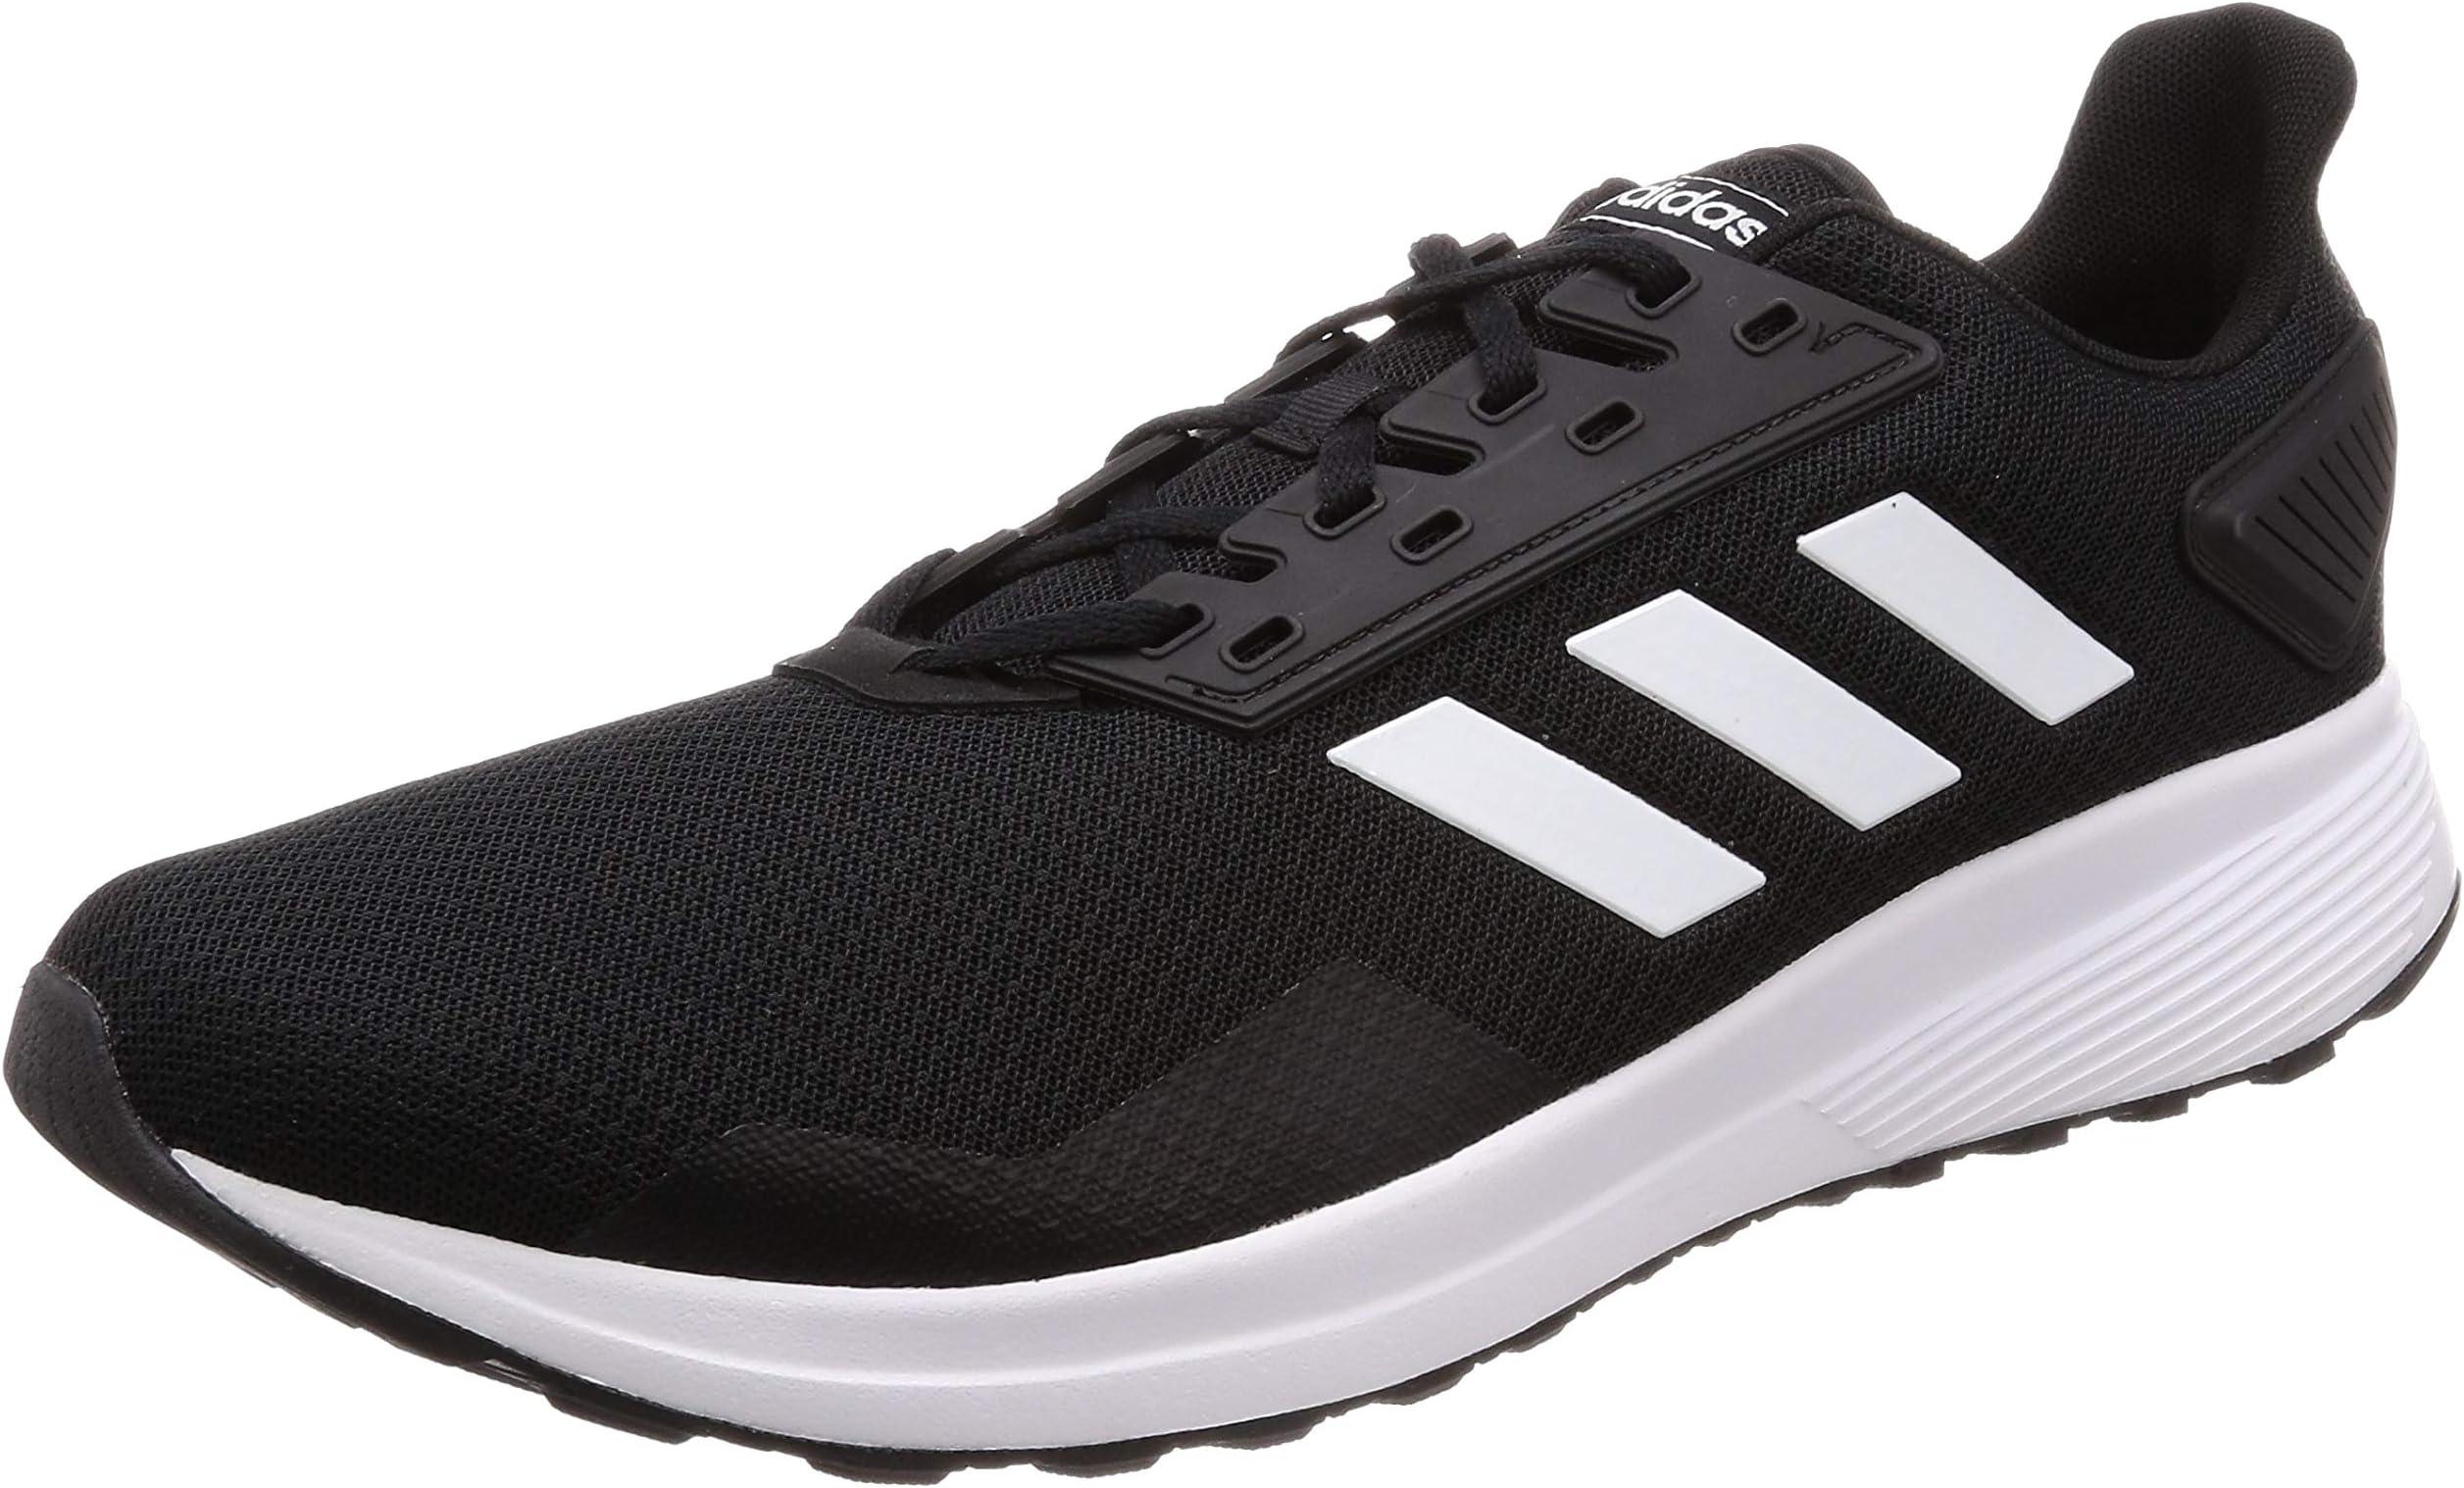 Crónica Leche hombro  adidas Duramo 9 Men's Road Running Shoes price in UAE | Amazon UAE | kanbkam